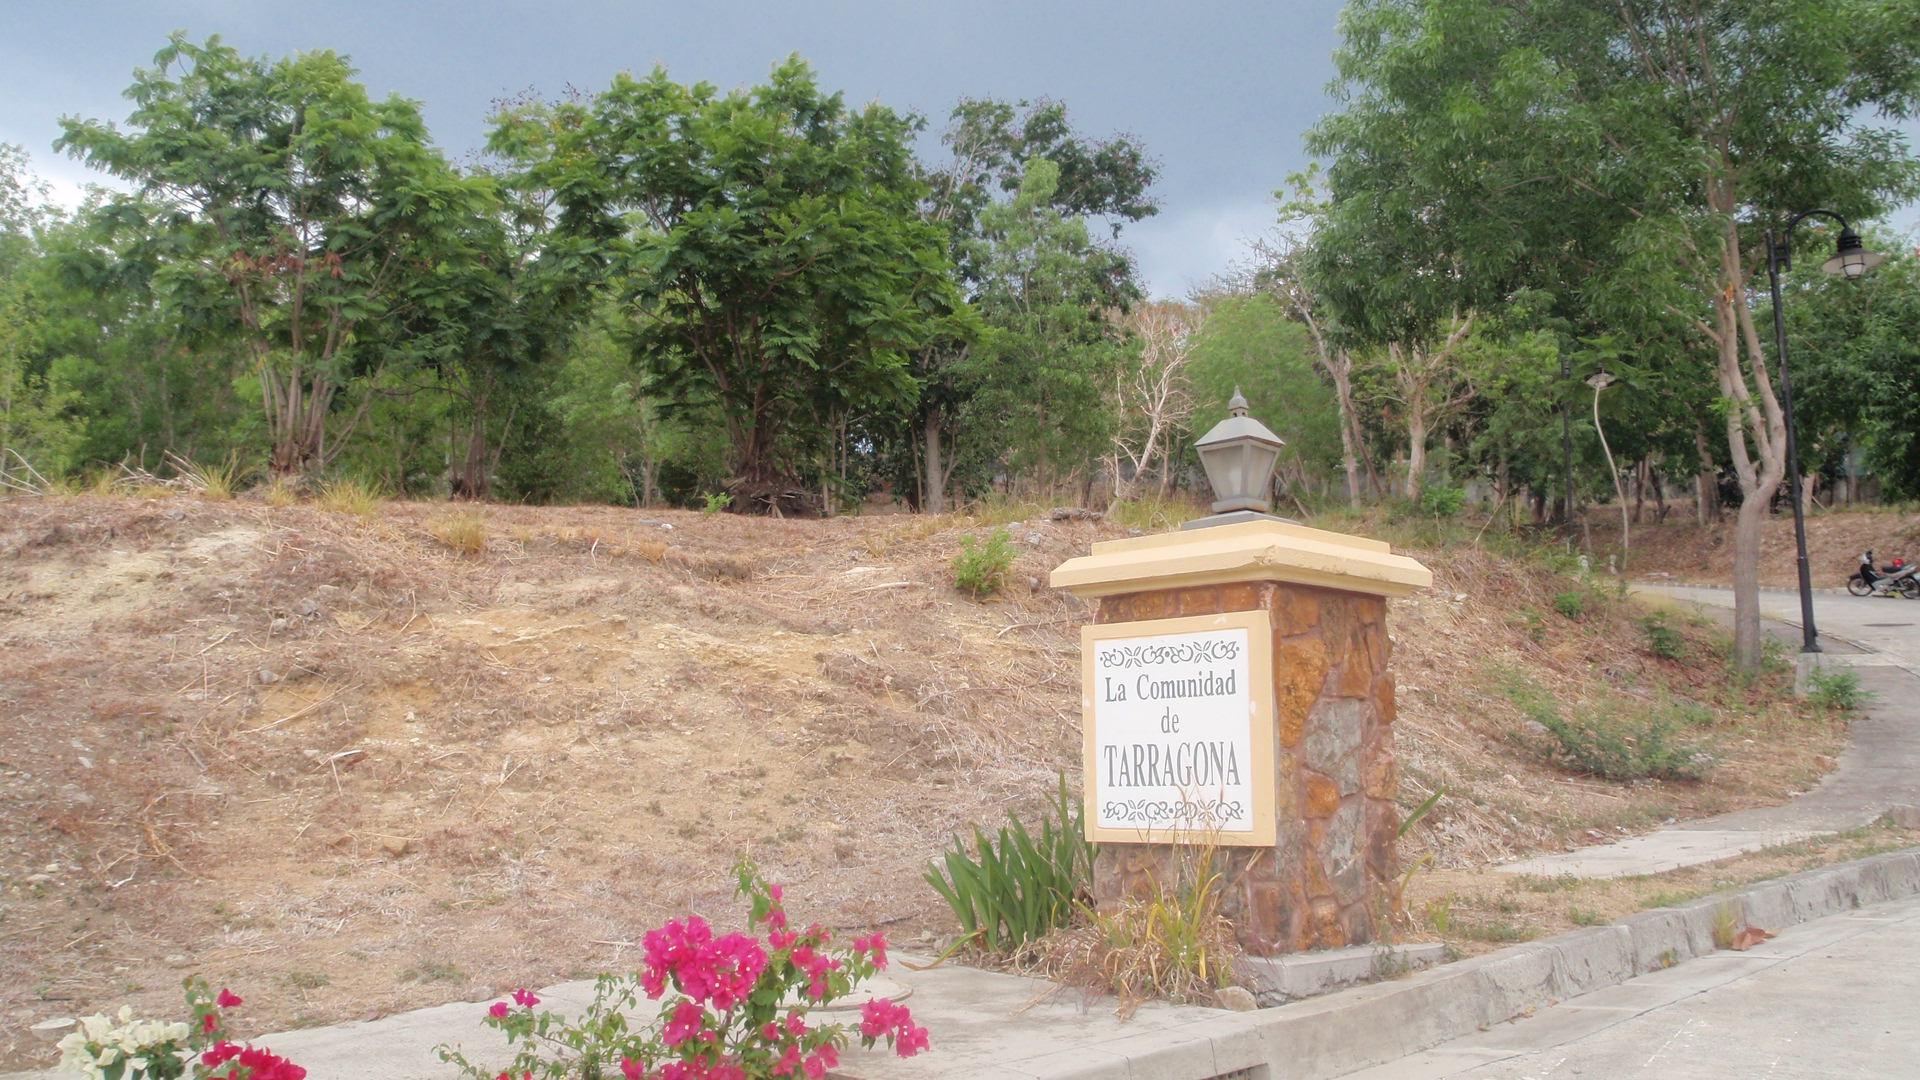 Terraza De Punta Fuego Lot Nasugbu Batangas Baguio City